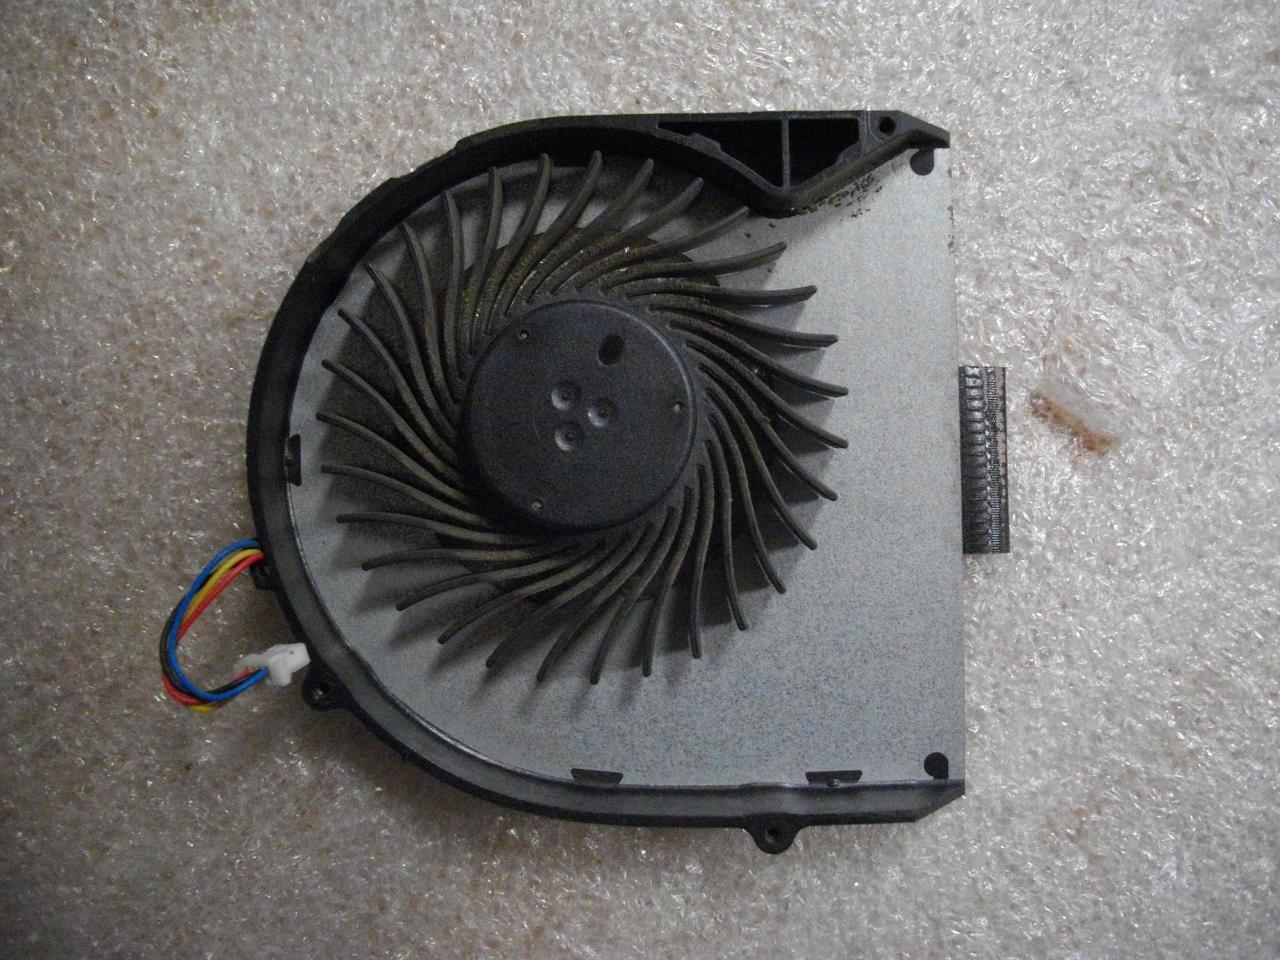 Вентилятор KSB0605HC оригинальный бу Lenovo IdeaPad B570 B575 V570 V575 Z570 Z575